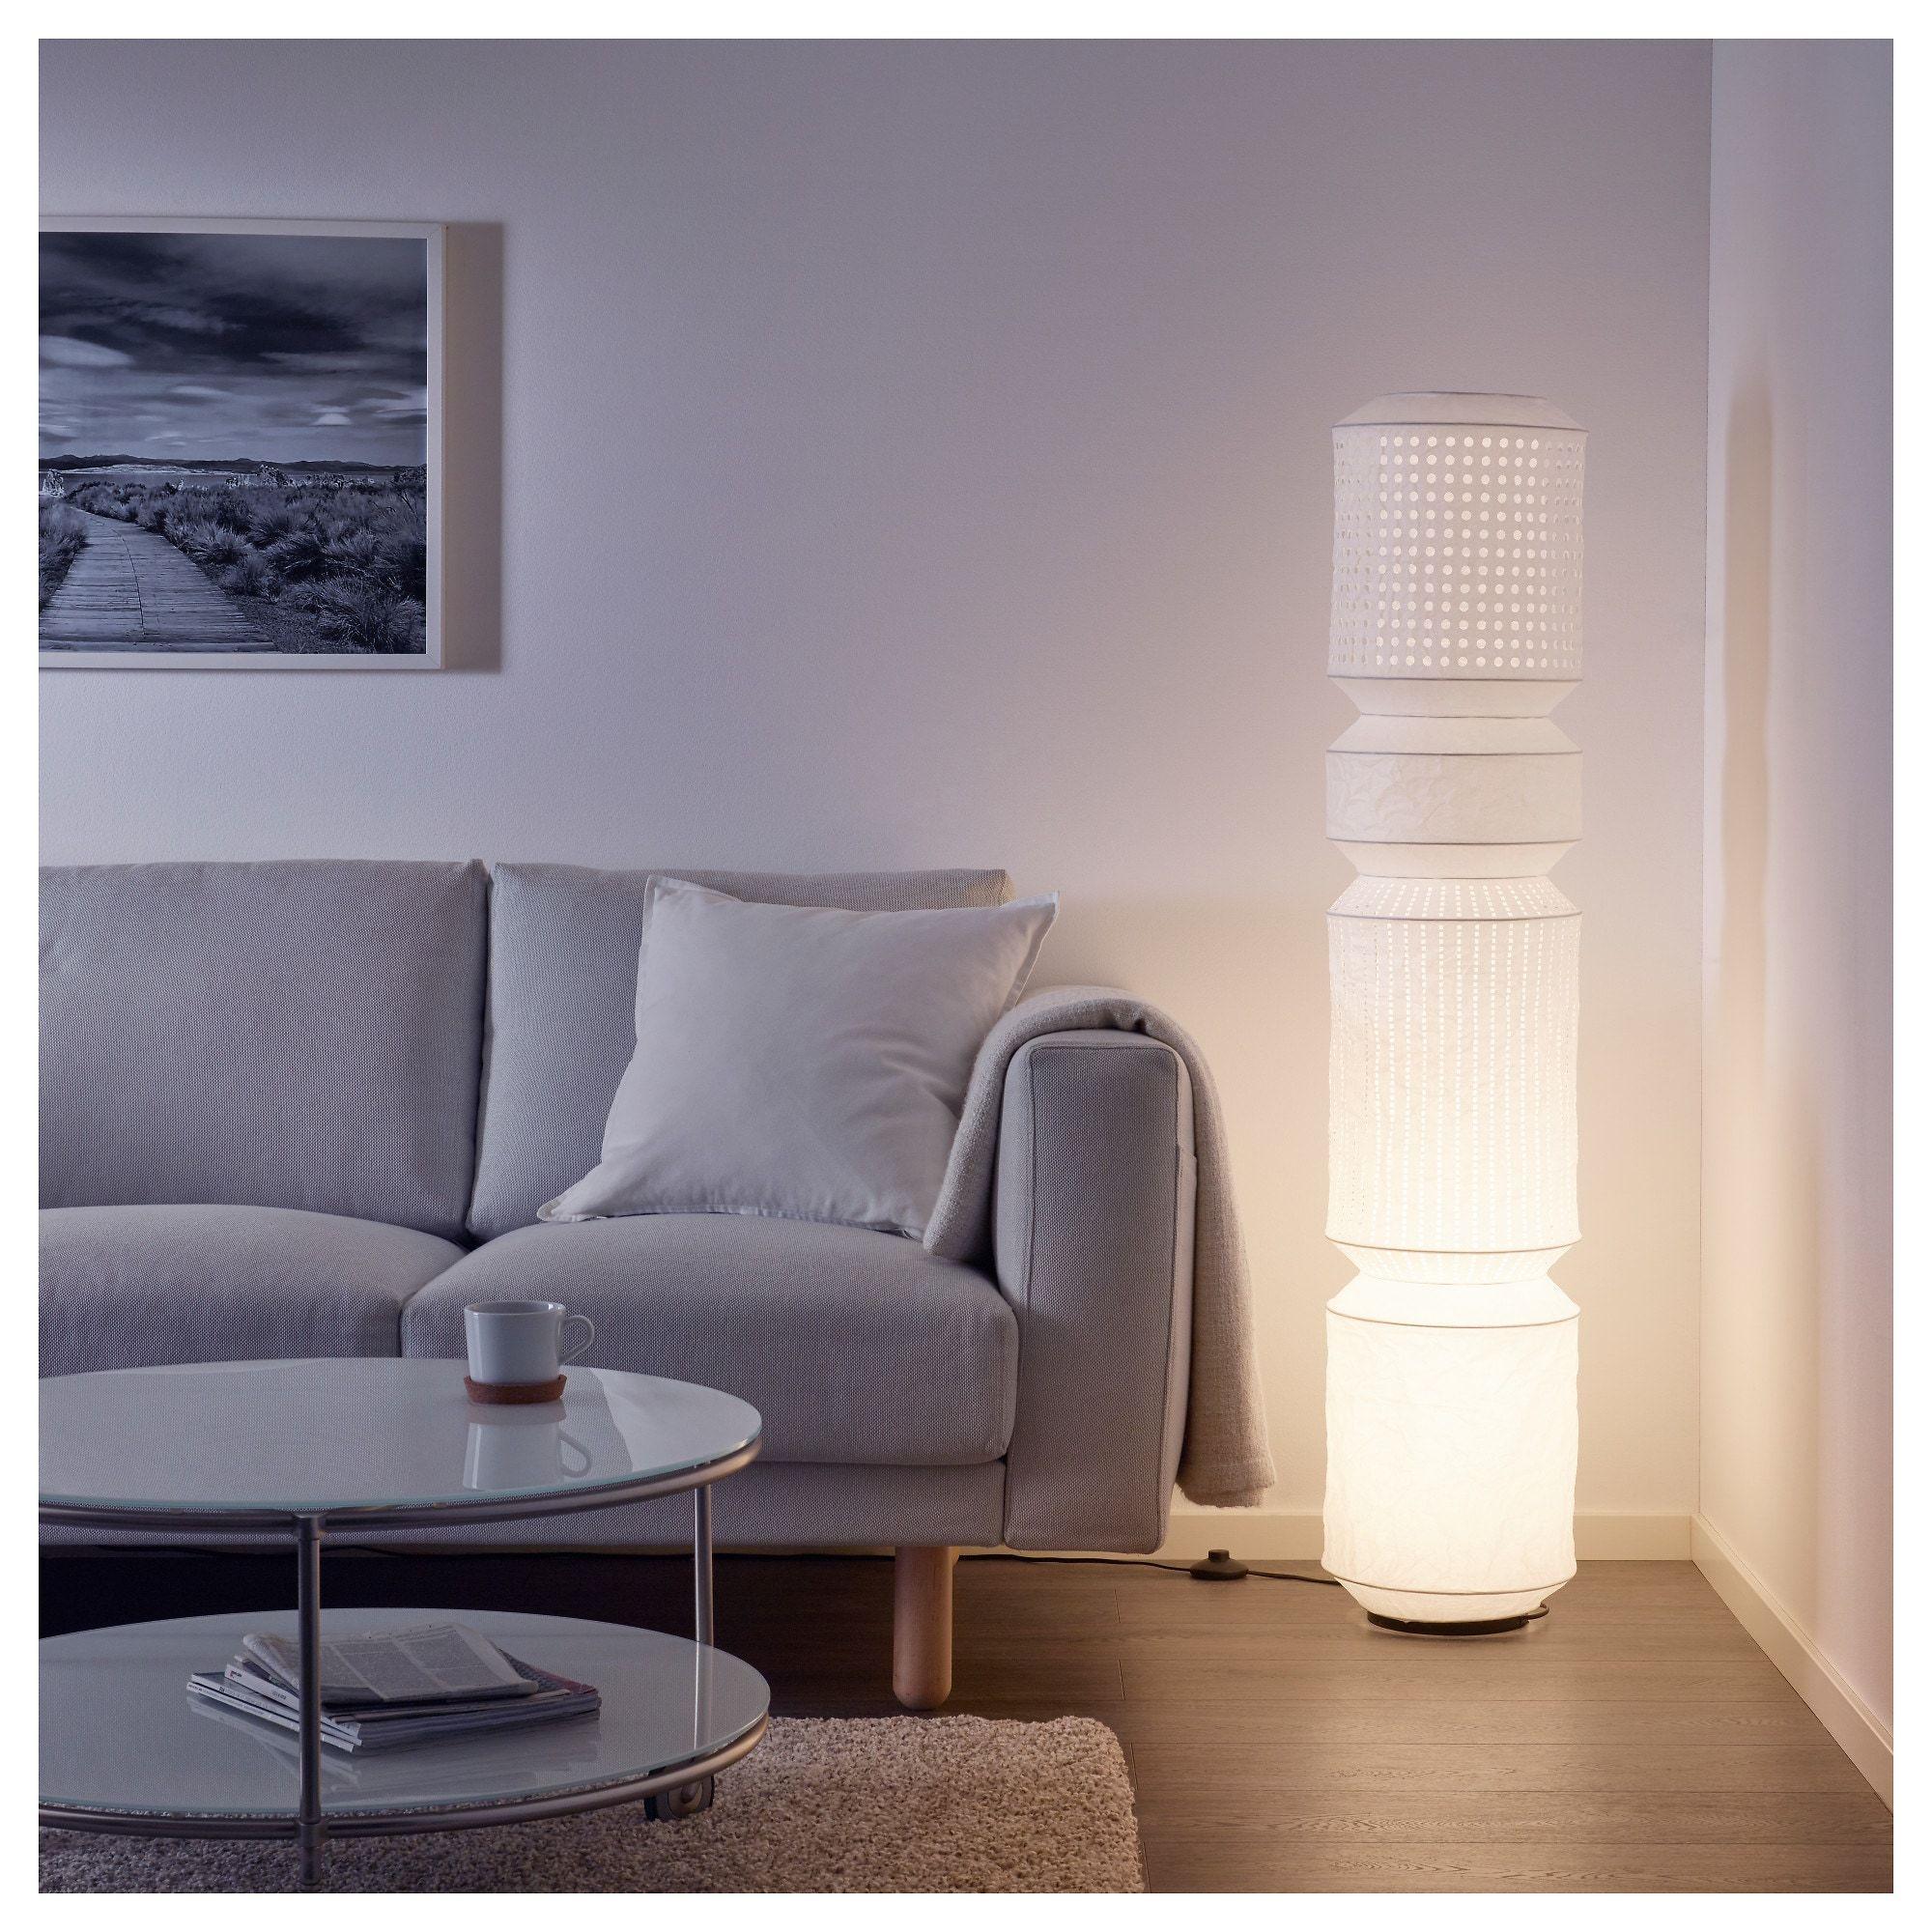 Ikea us furniture and home furnishings white floor